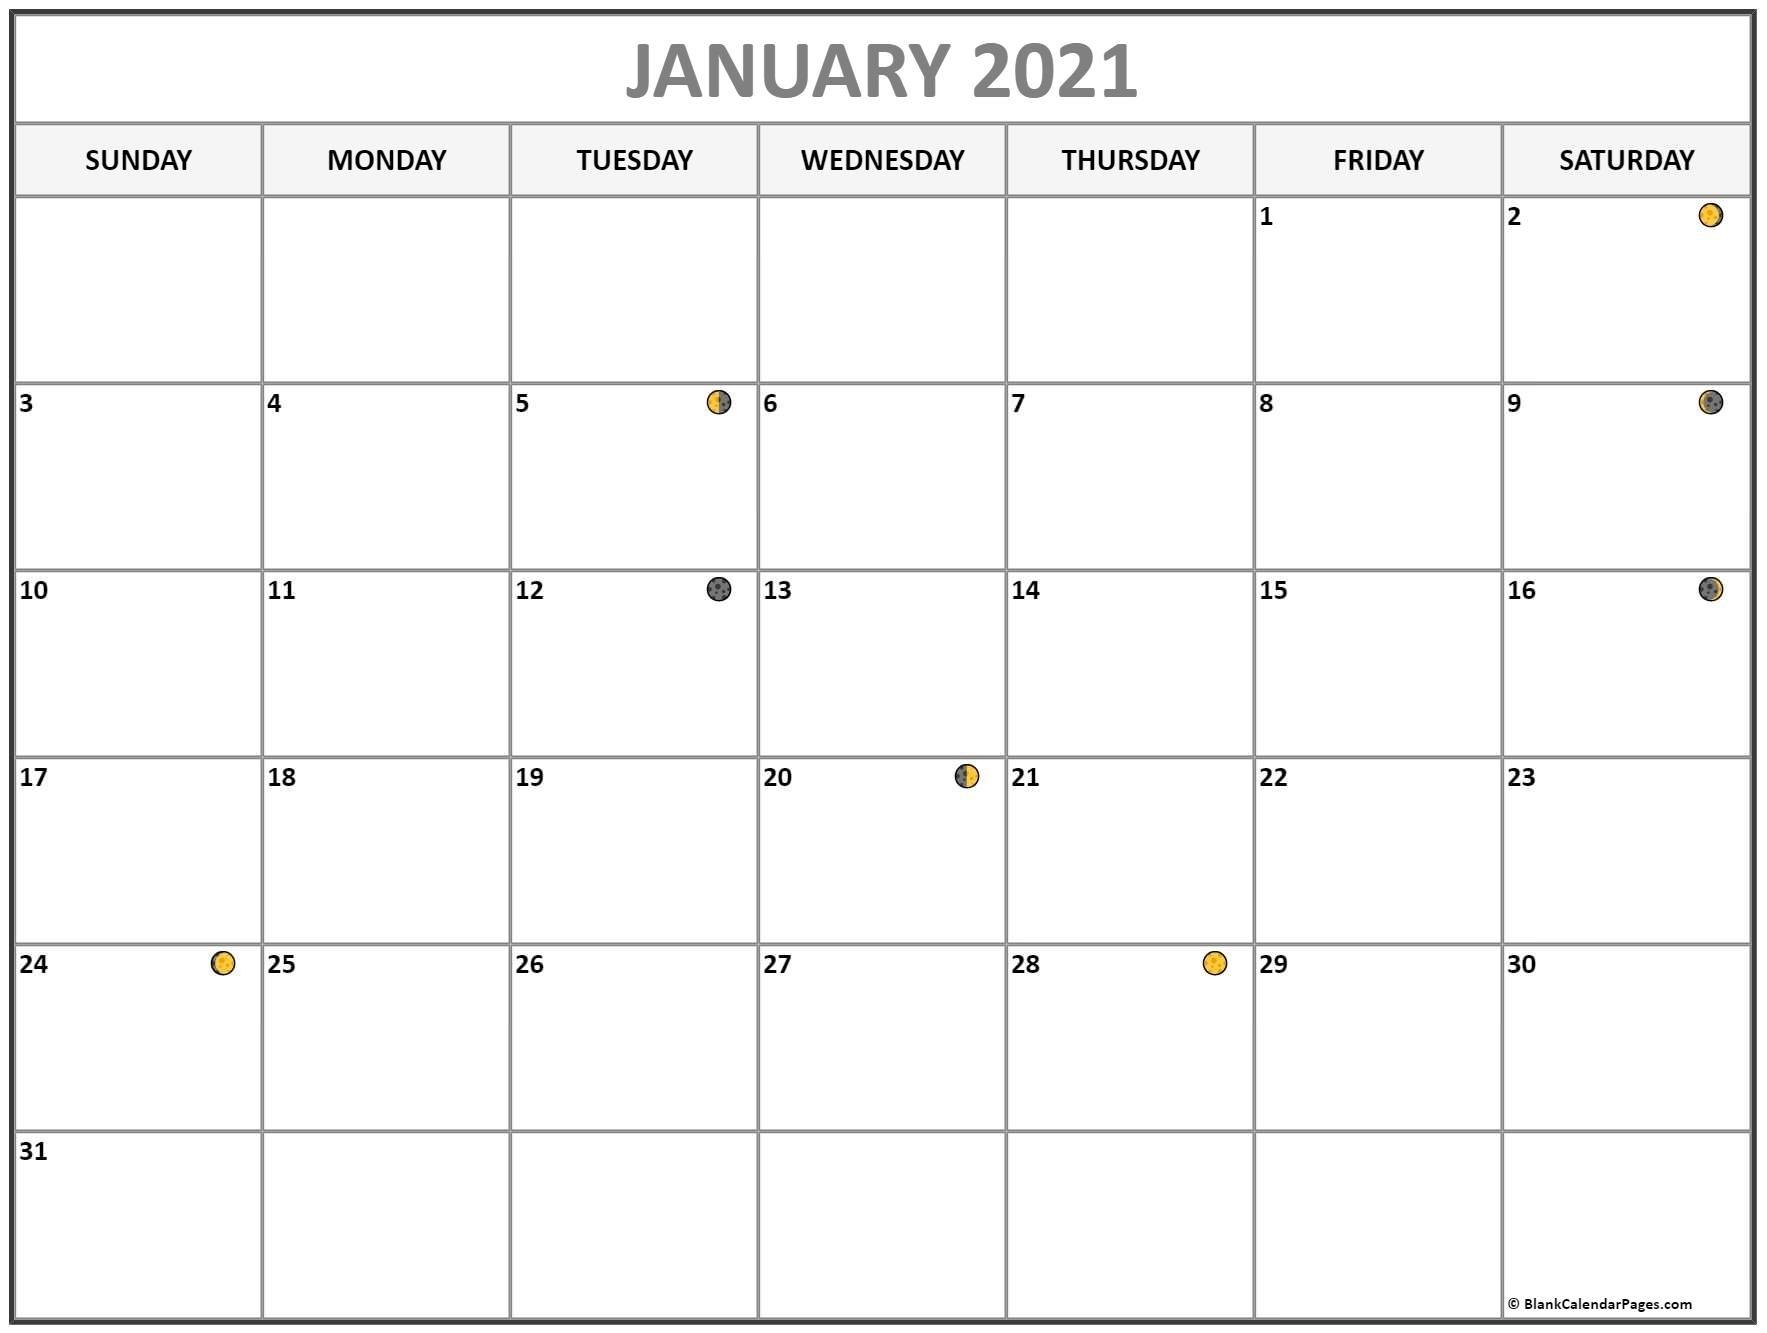 Catch Moon Phases September 2021 - Best Calendar Example September 2021 Lunar Calendar